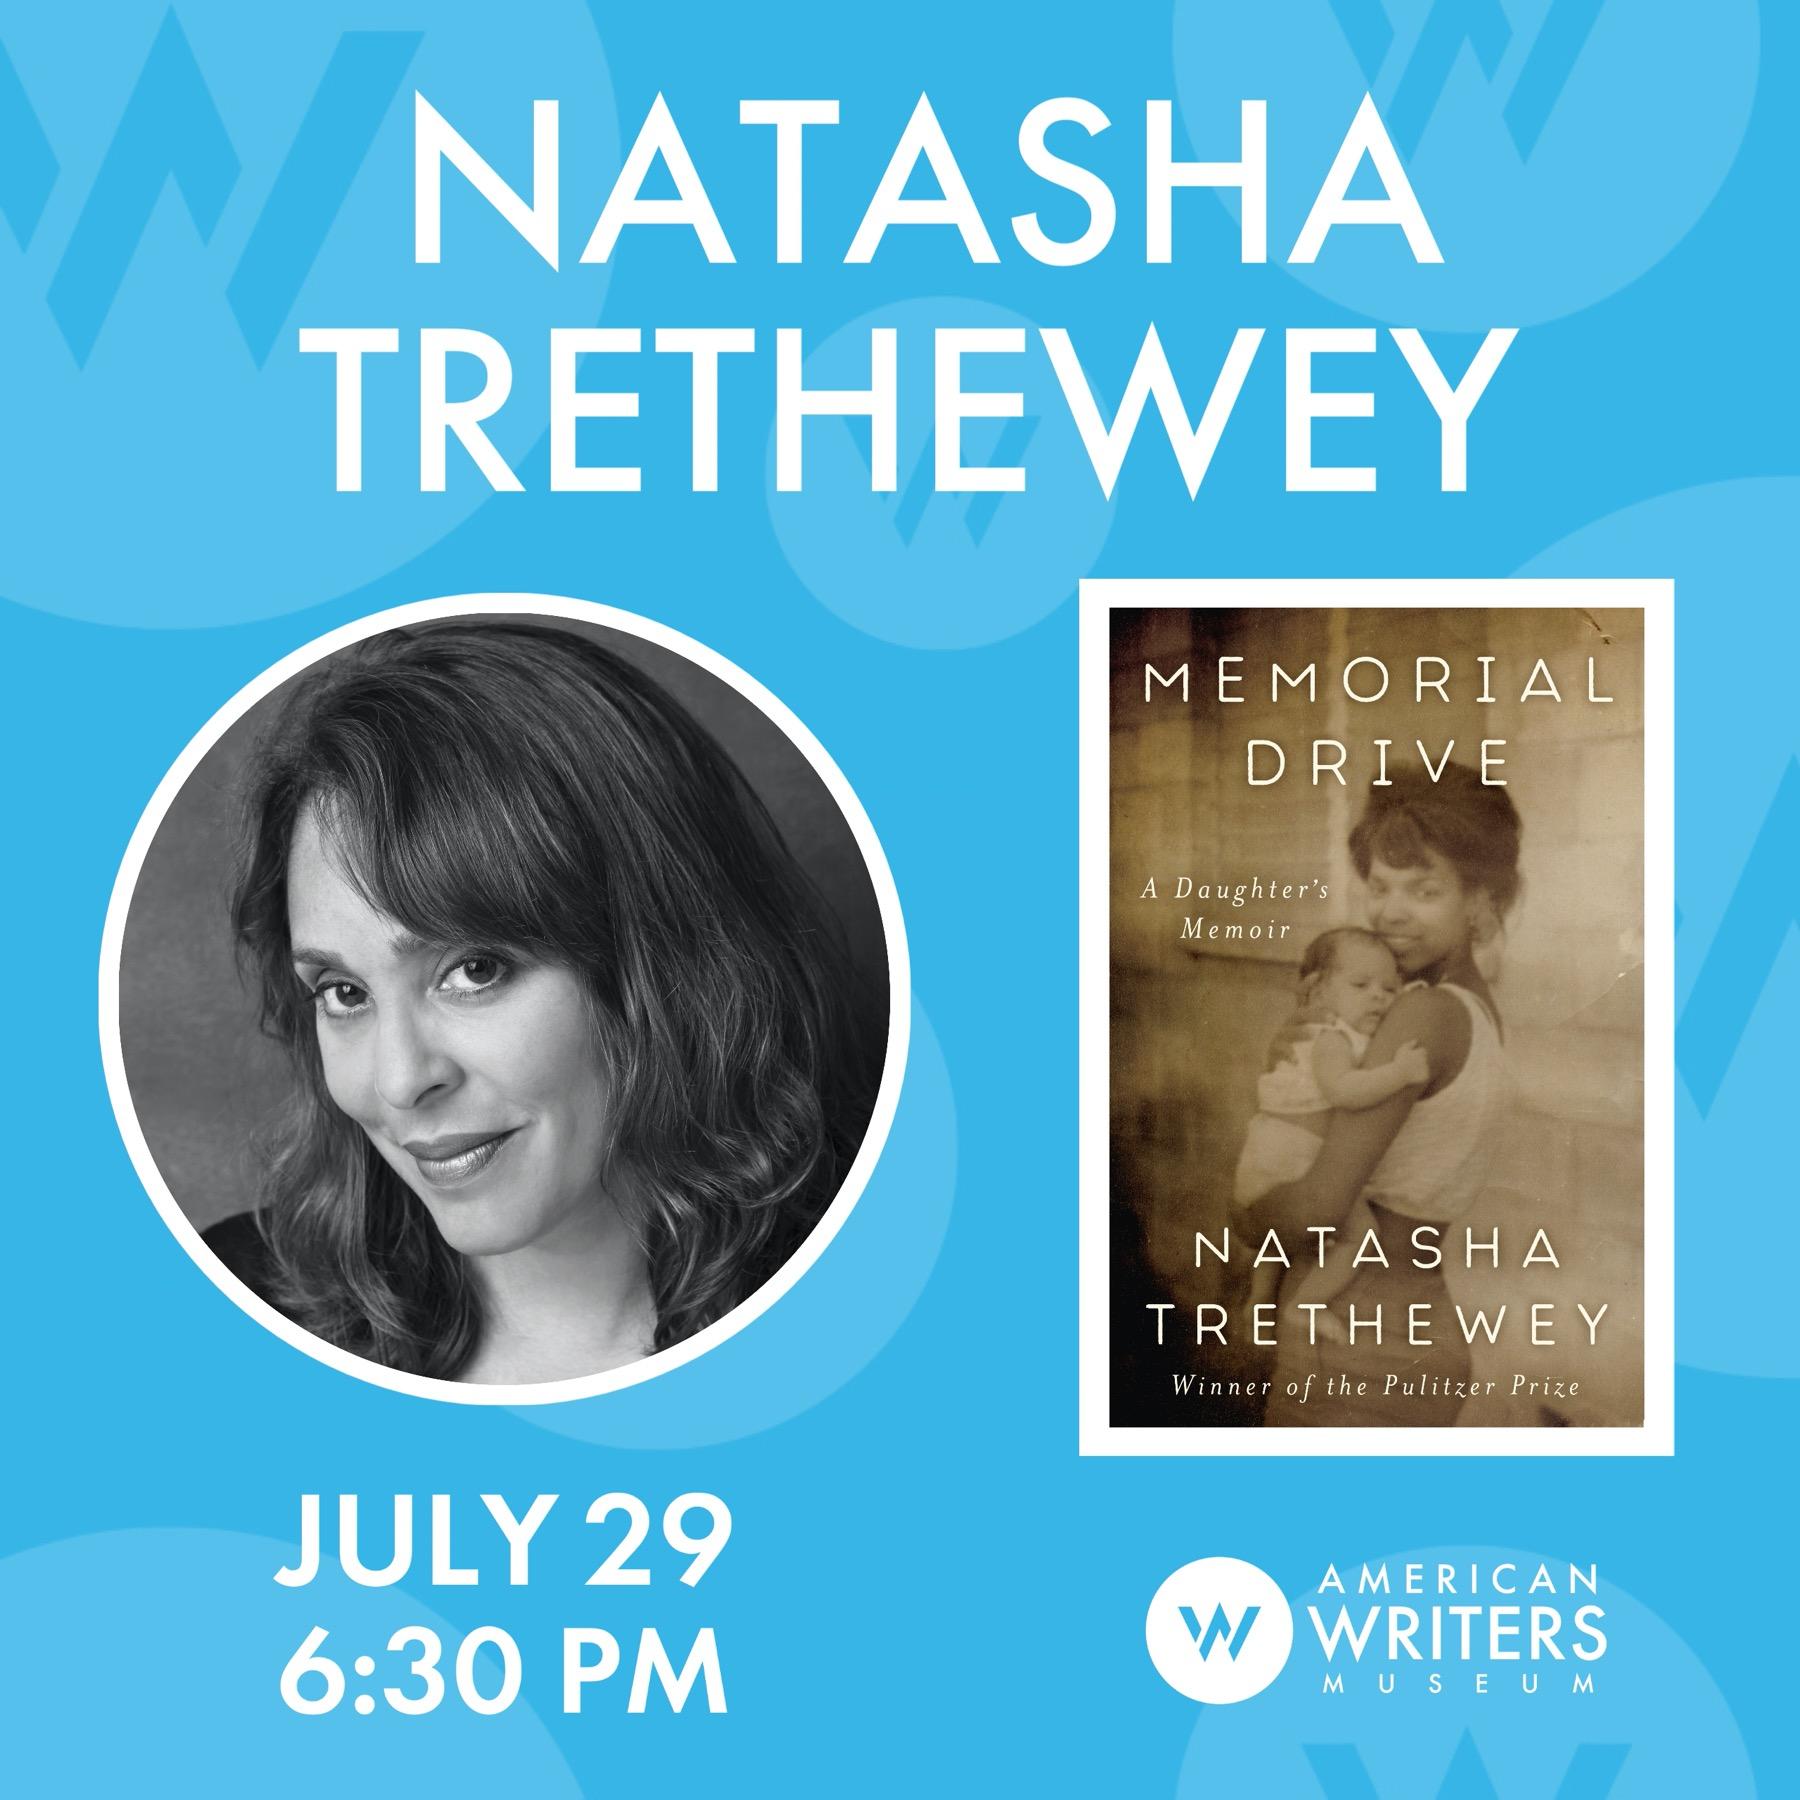 Natasha Trethewey: Memorial Drive